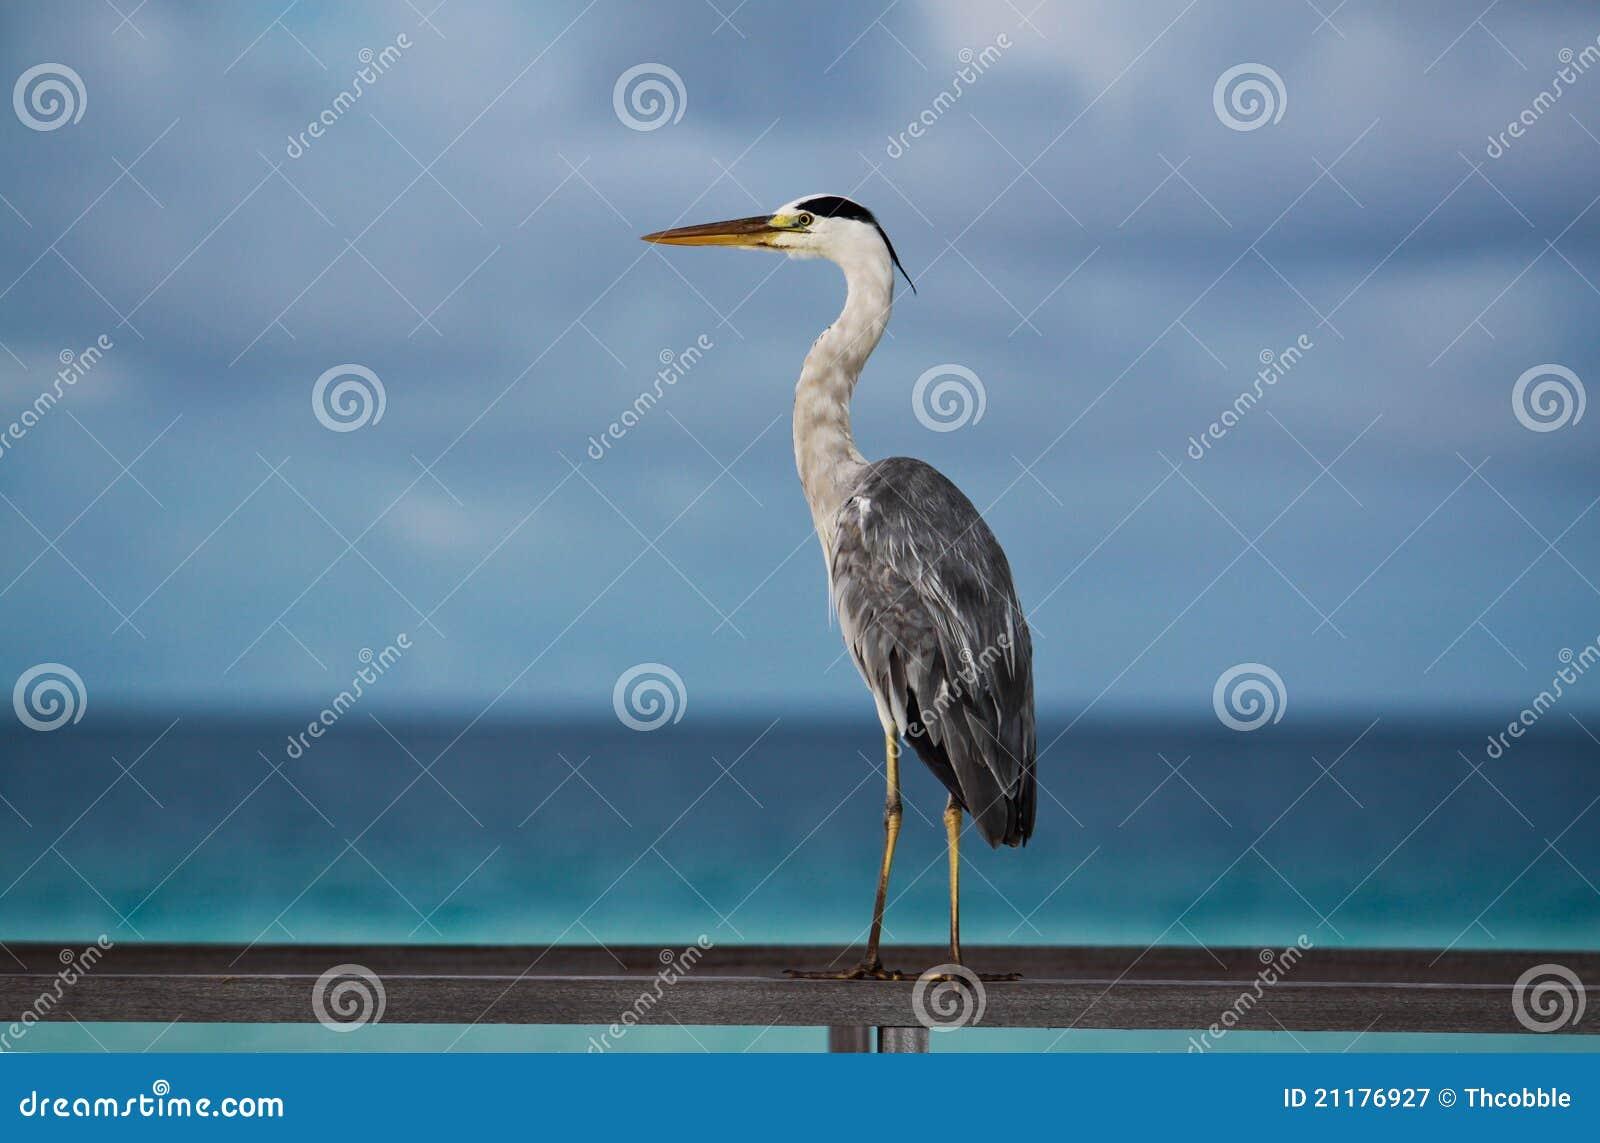 Maldives tropical seabird